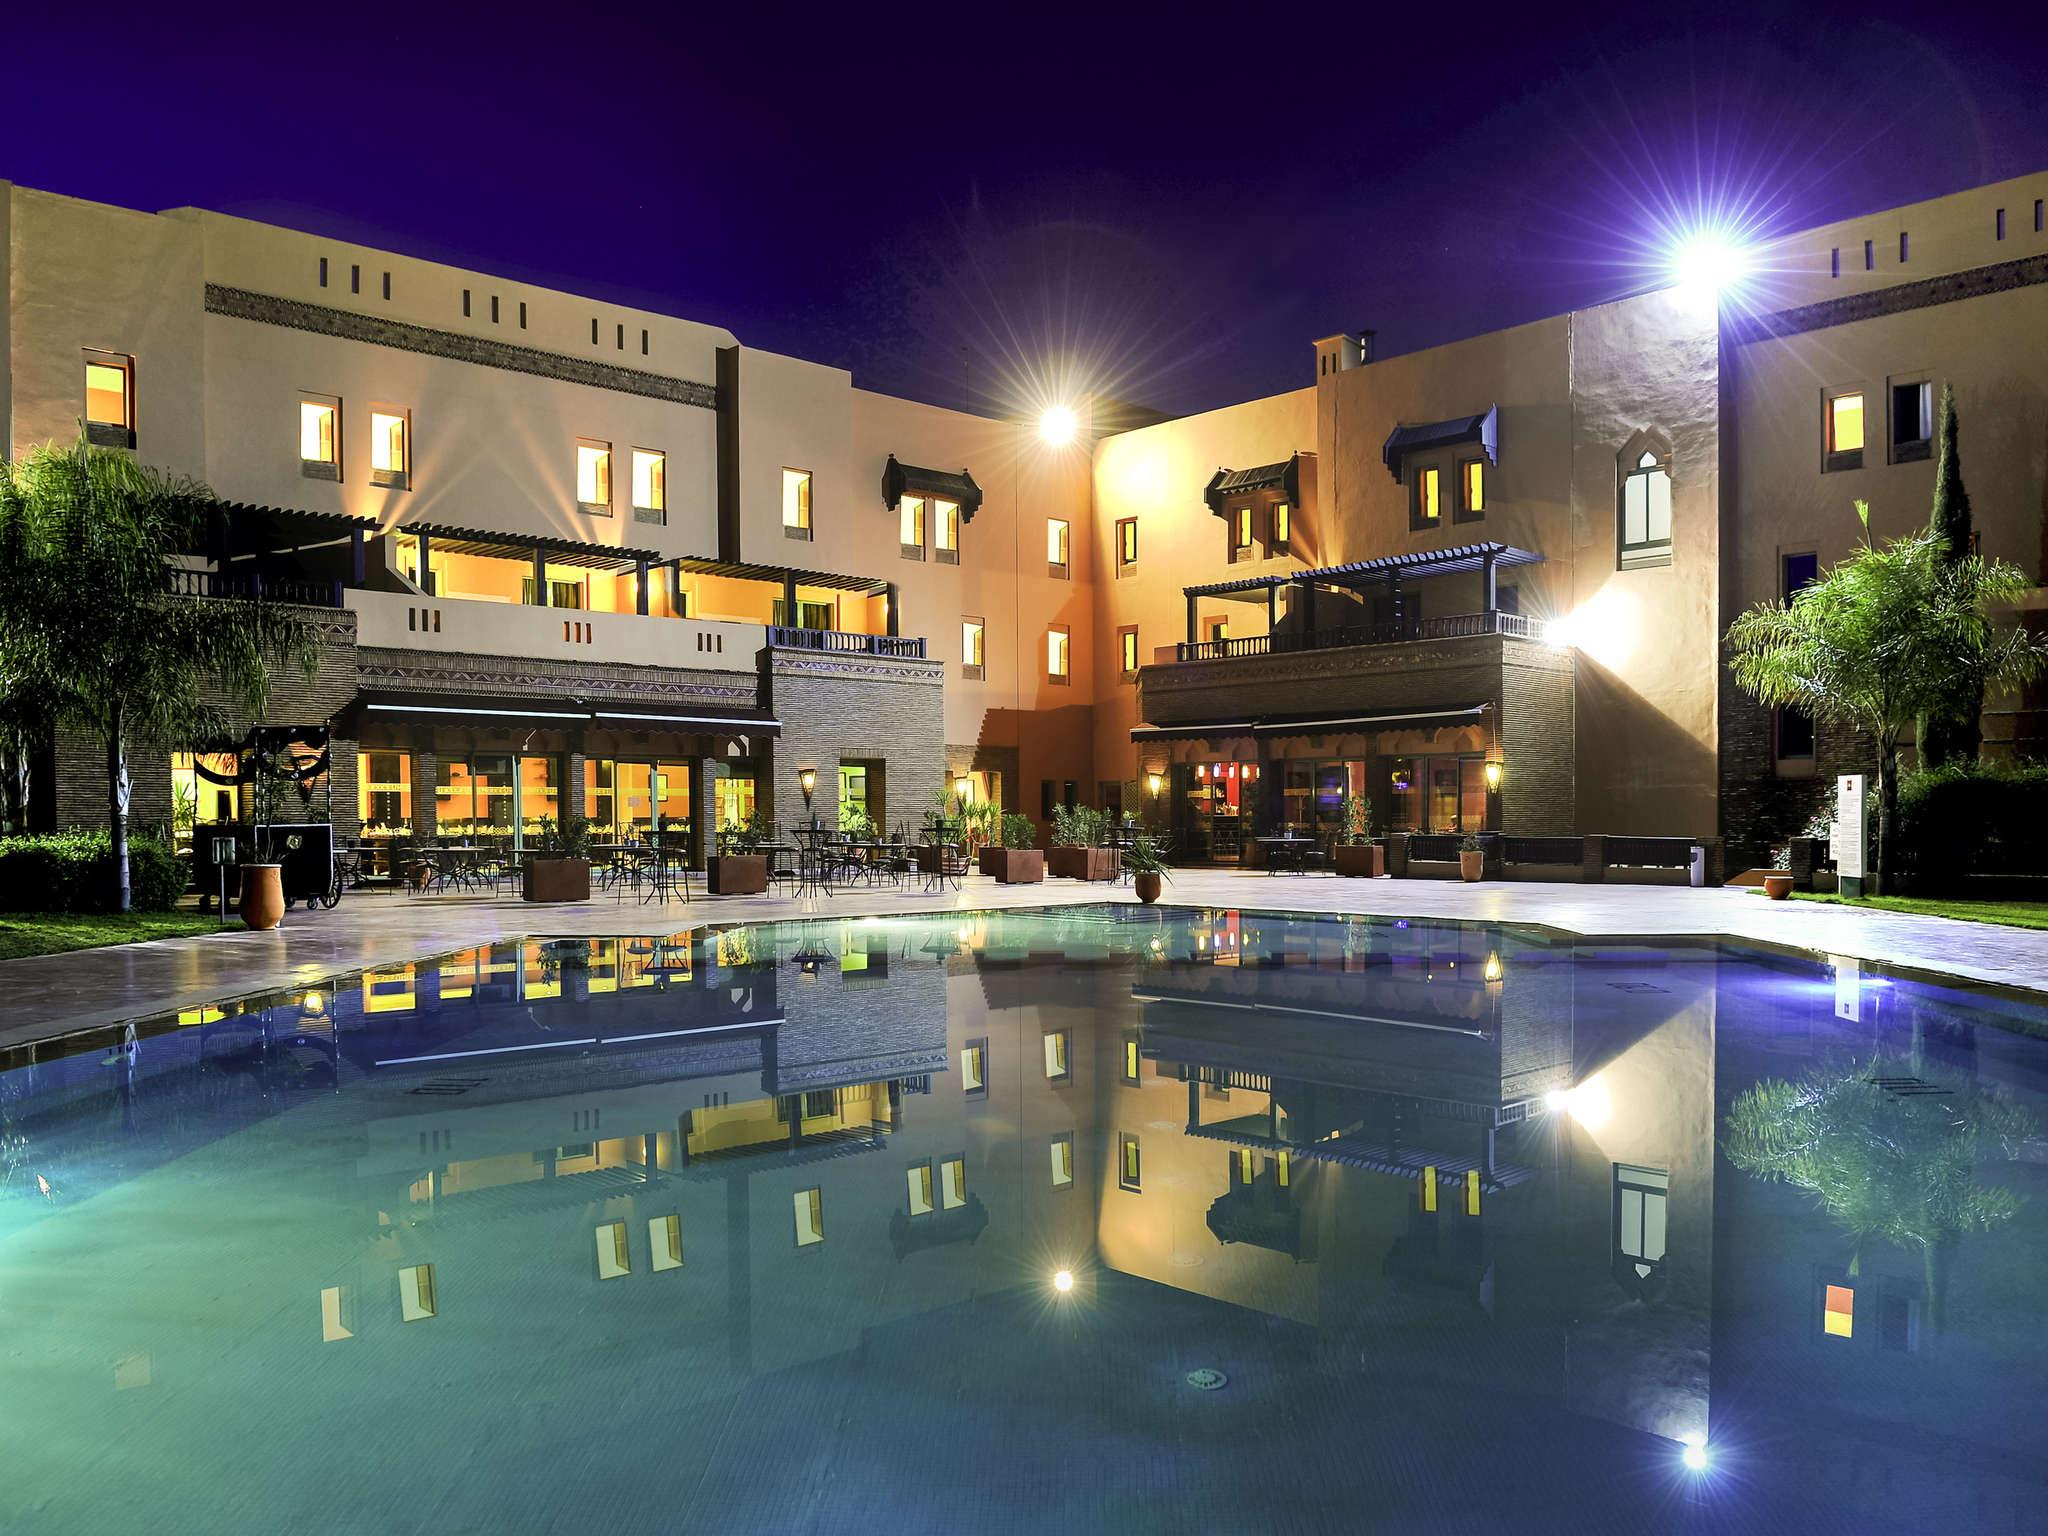 Hotel – Ibis Moussafir Marrakech Palmeraie